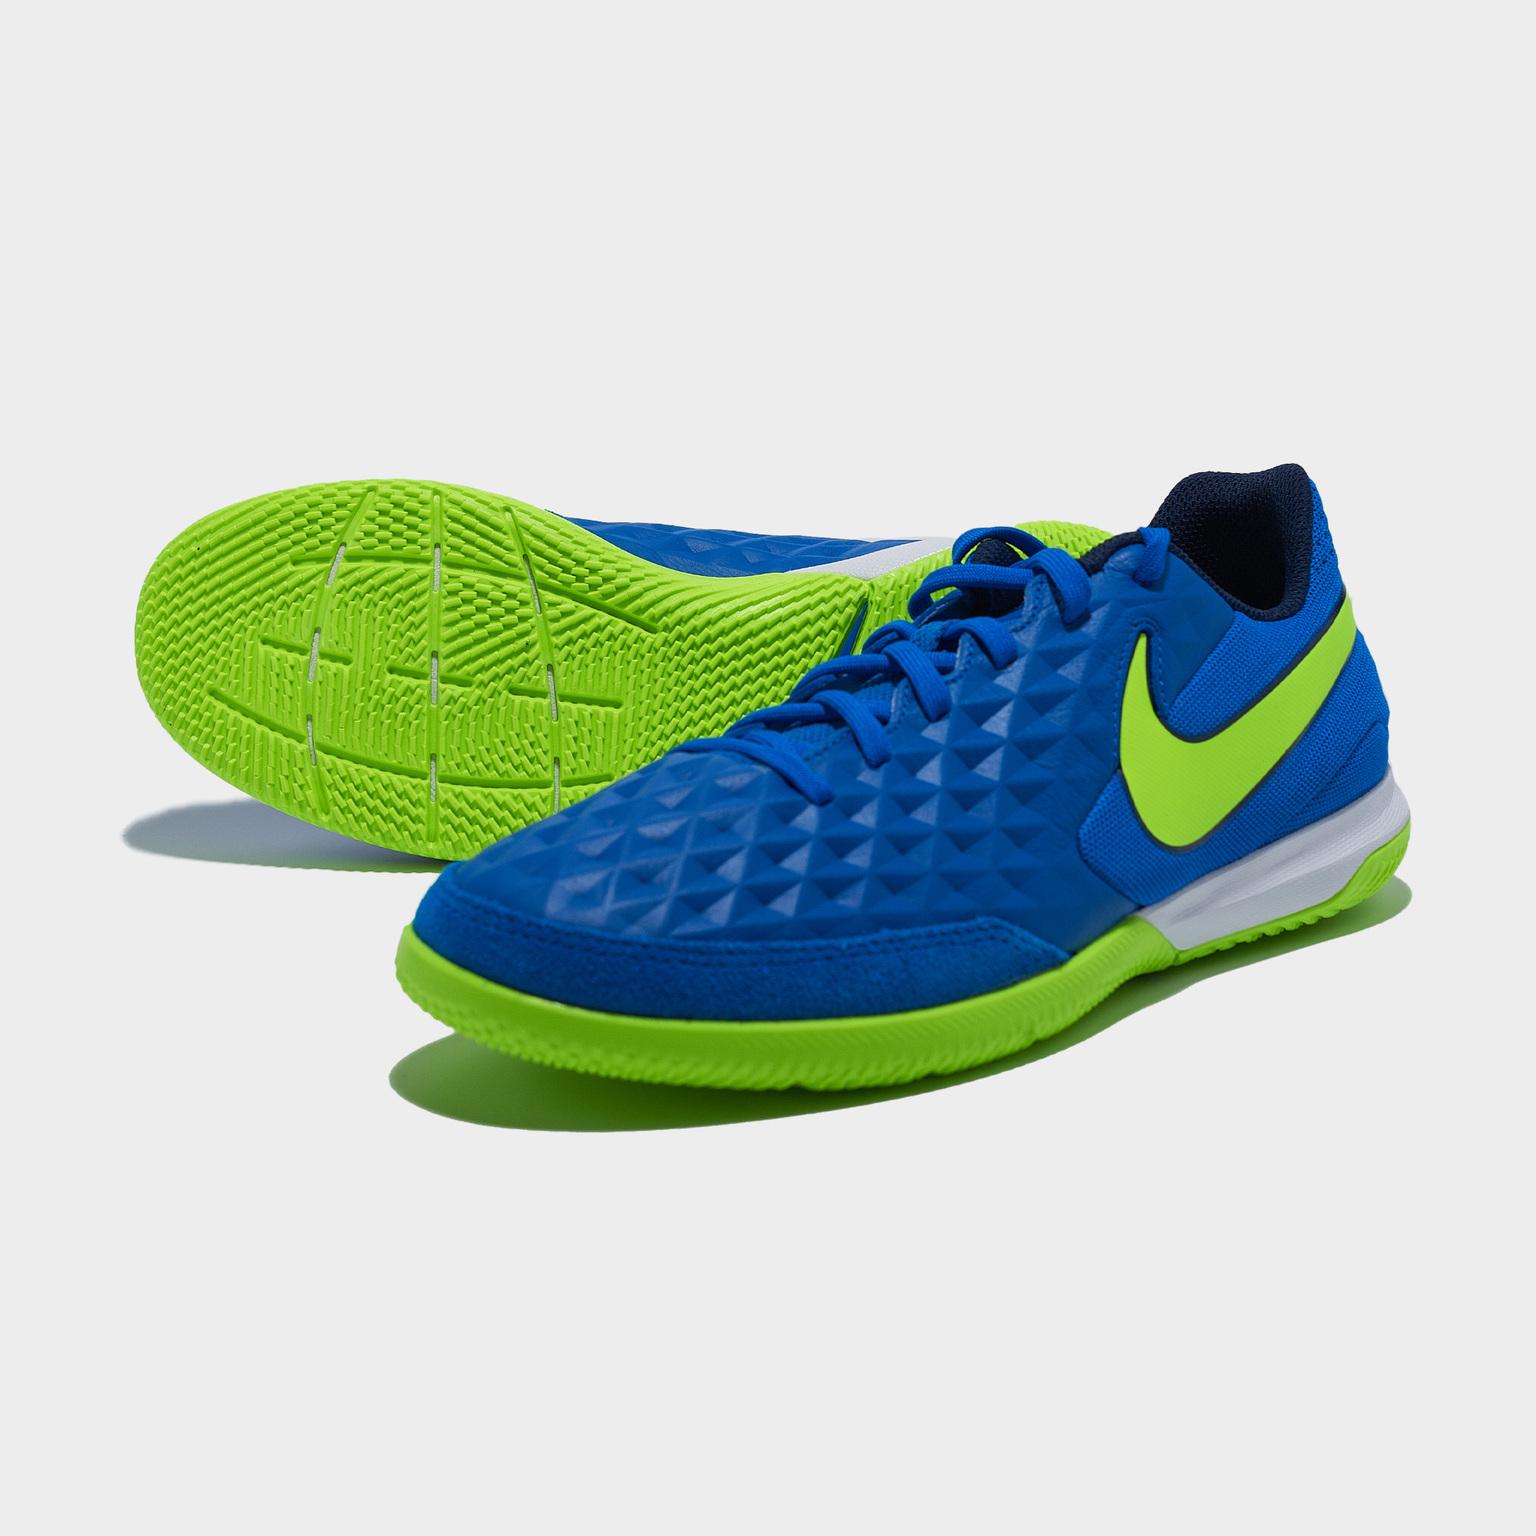 Футзалки Nike Legend 8 Academy IC AT6099-474 футзалки детские nike legend 8 academy ic at5735 606